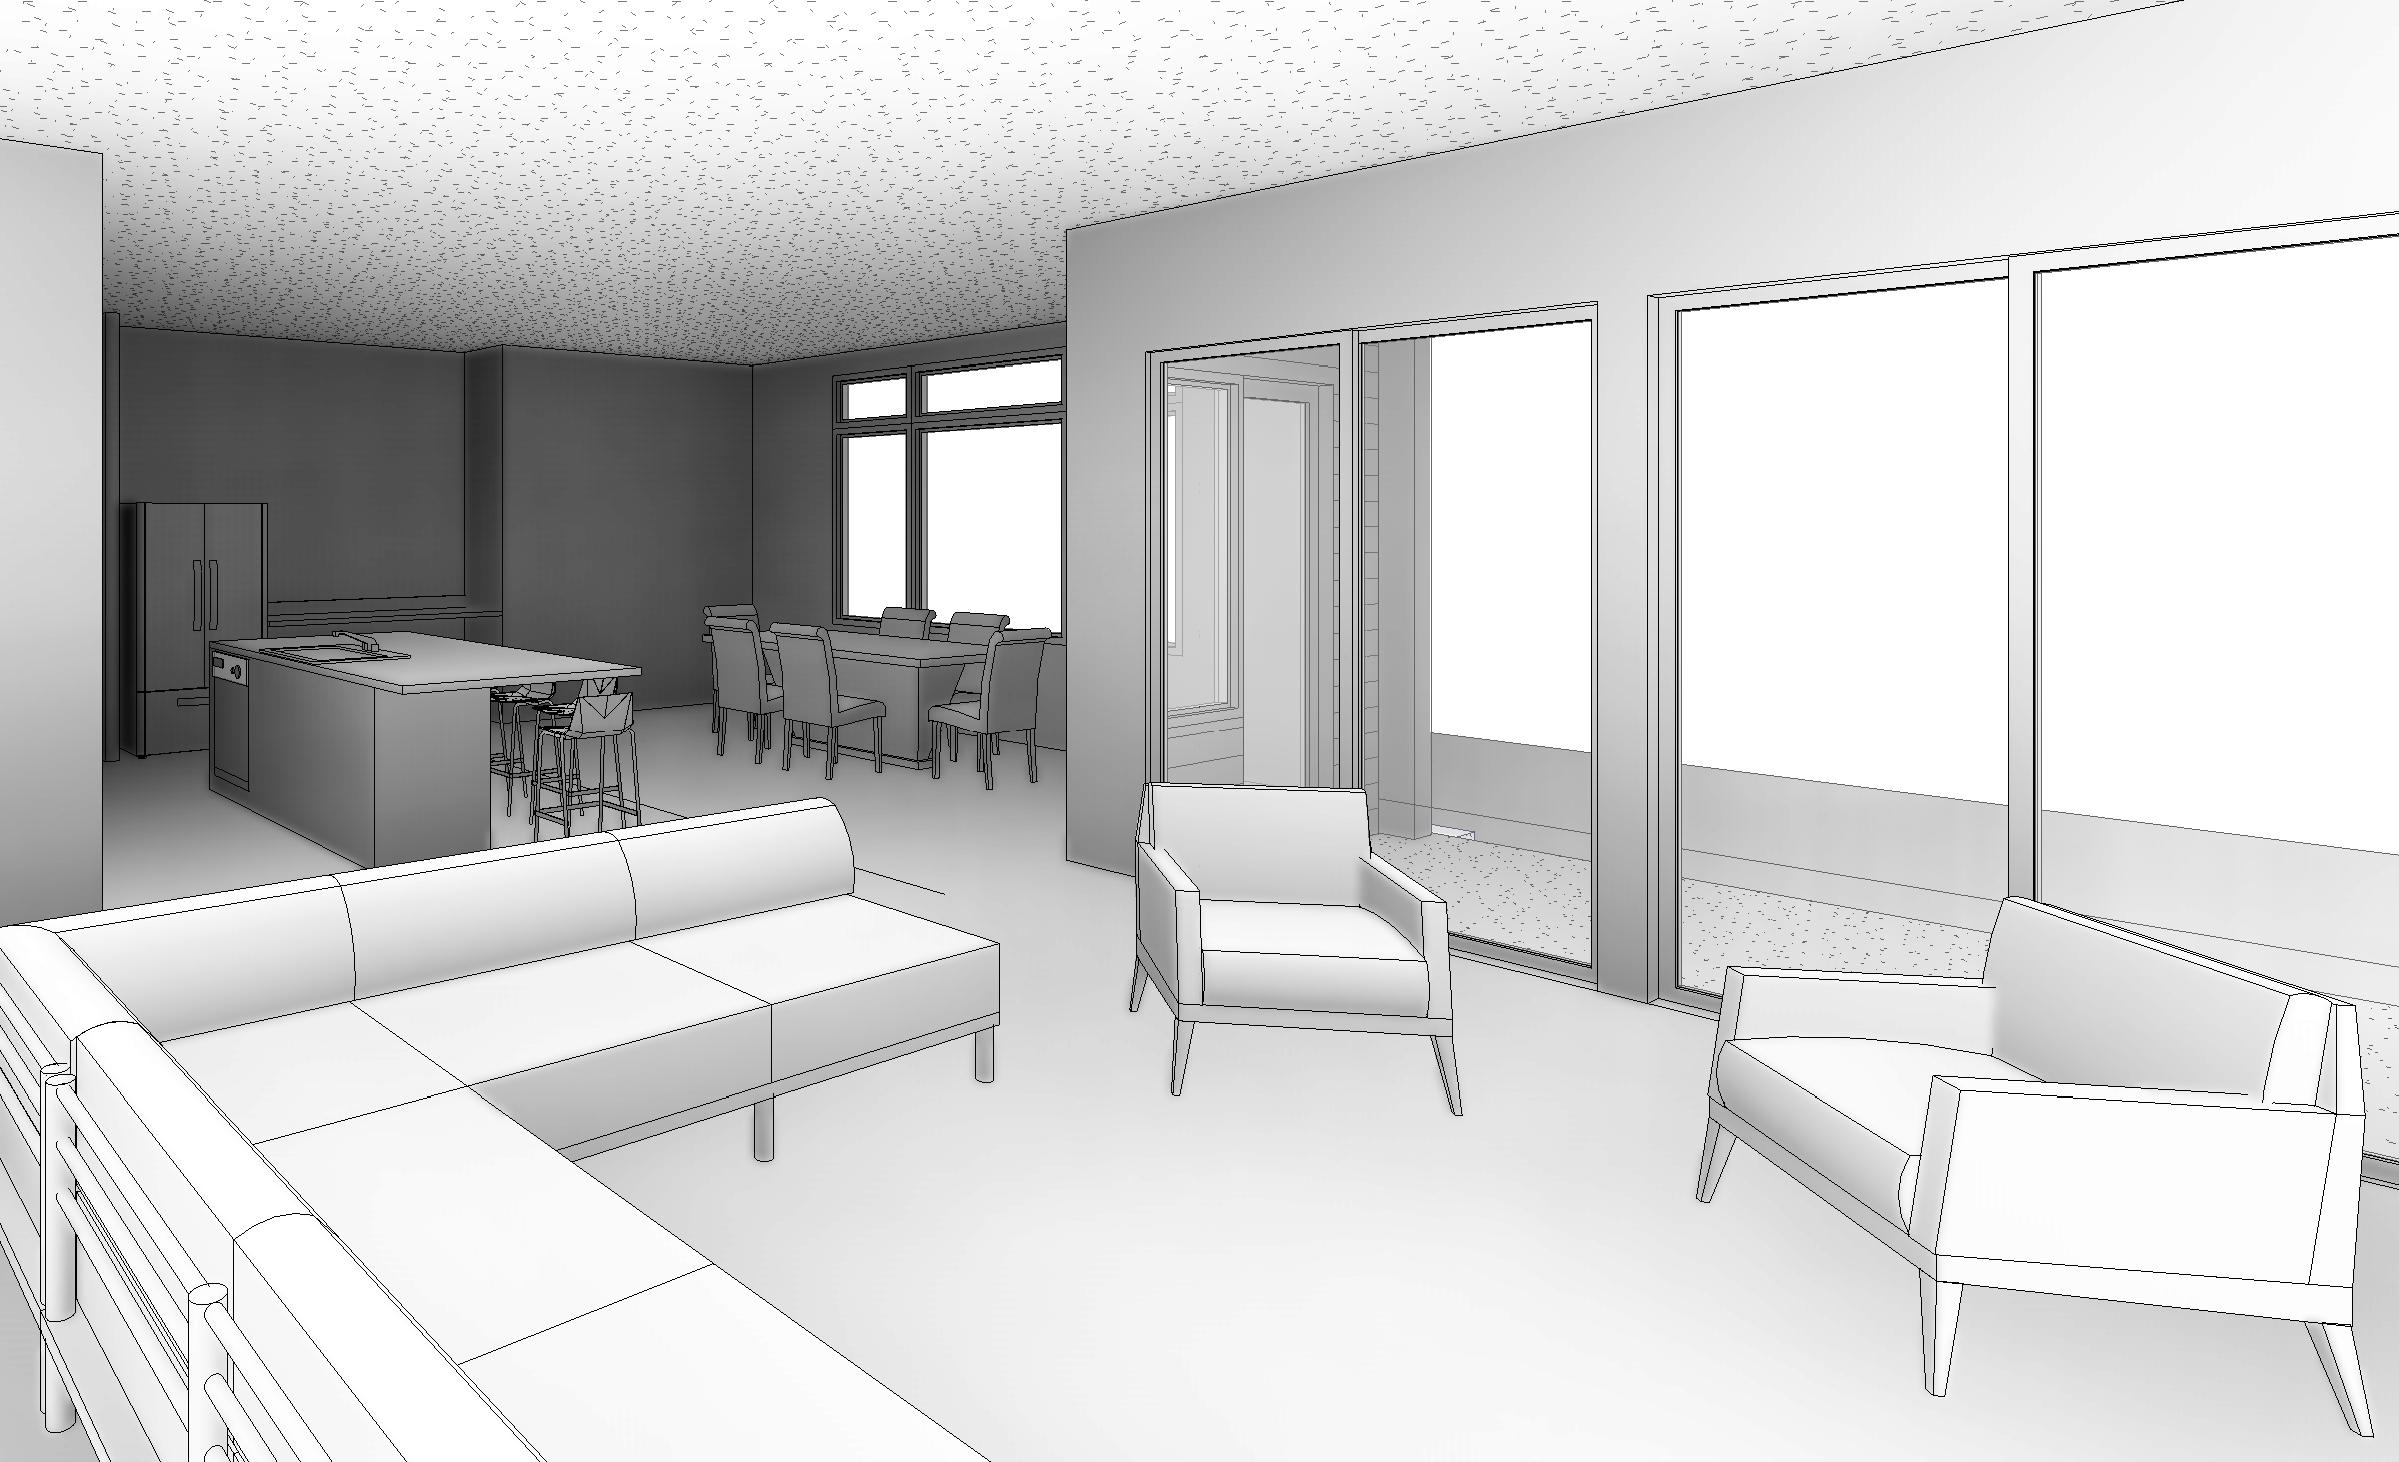 Hyde Residence CD - 3D View - LIVING ROOM - KITCHEN - DINING.jpg